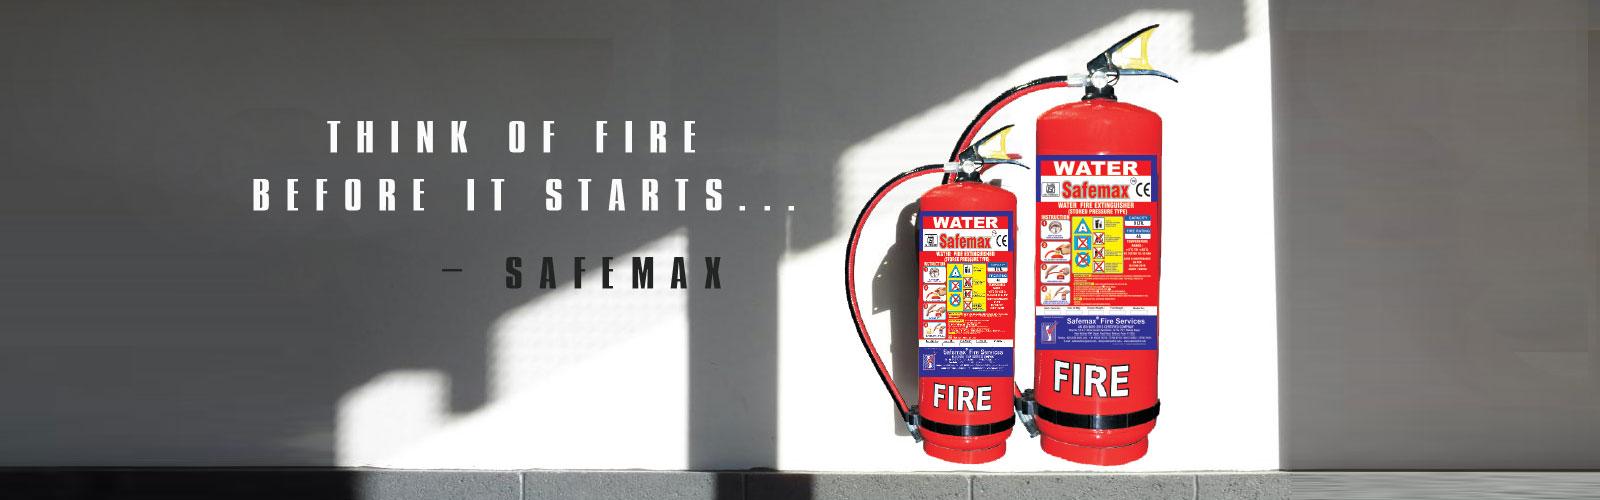 Safemax Fire Services